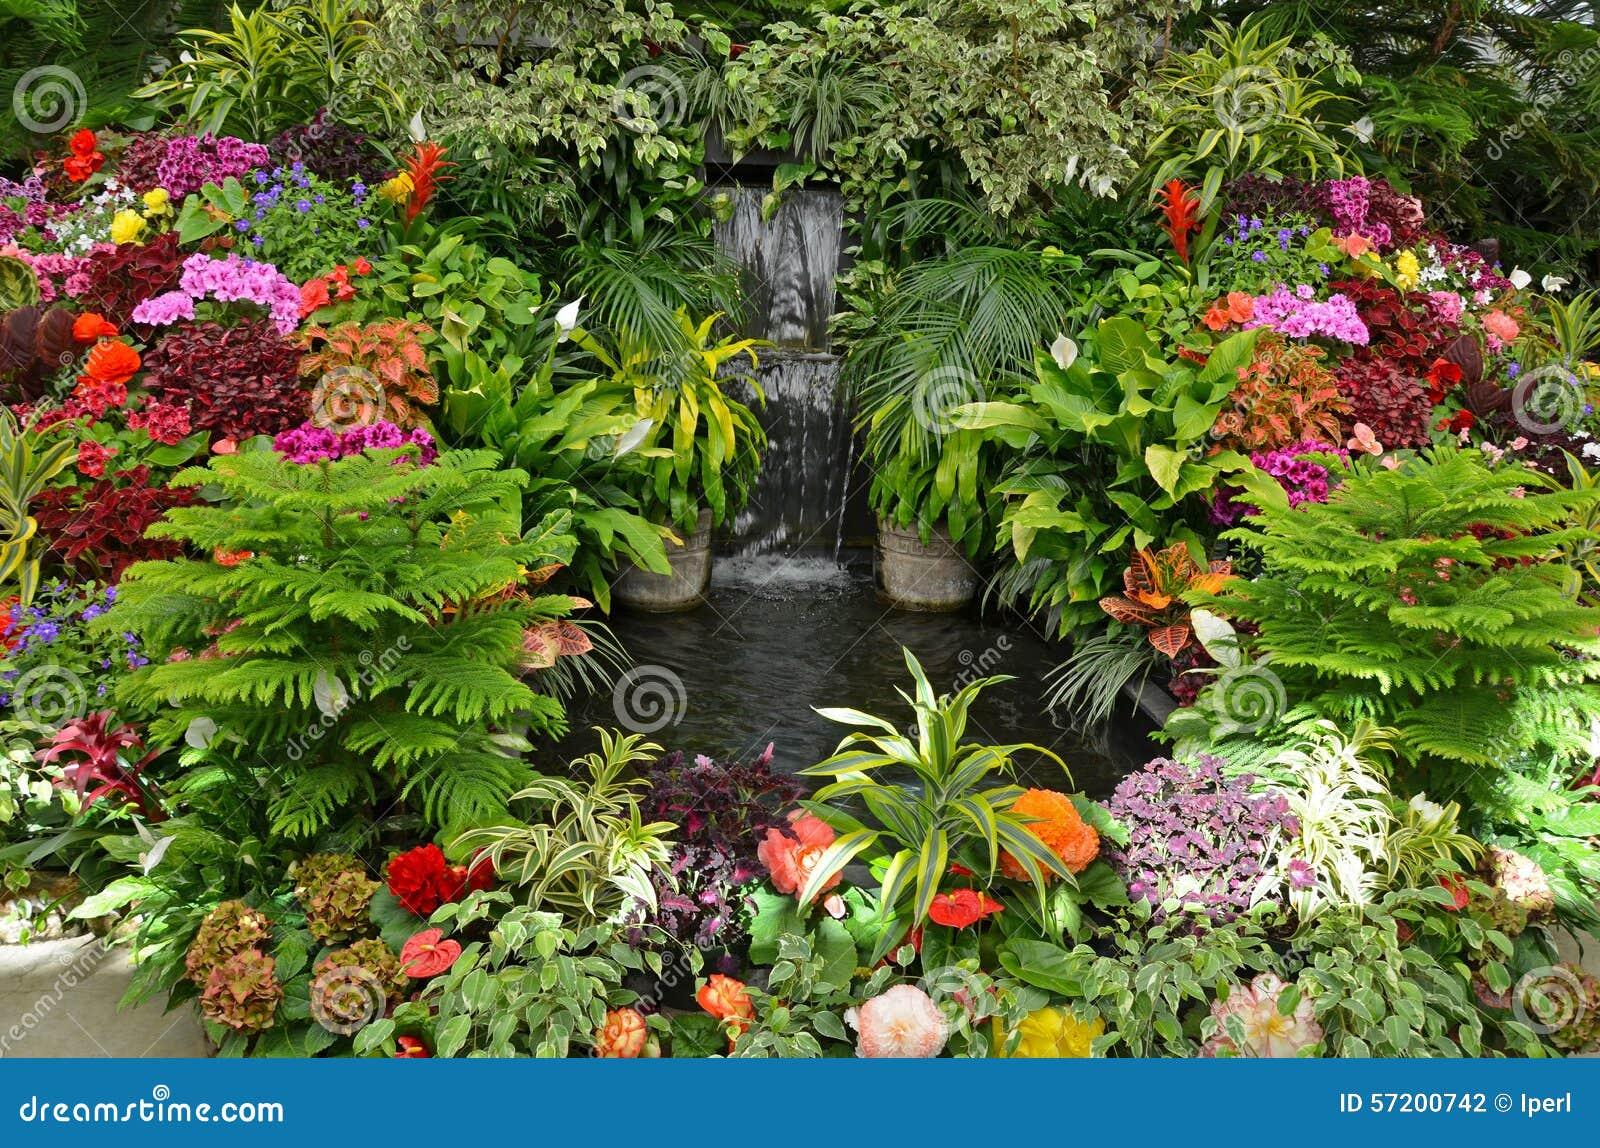 Colorful Tropical Garden Stock Photo Image 57200742